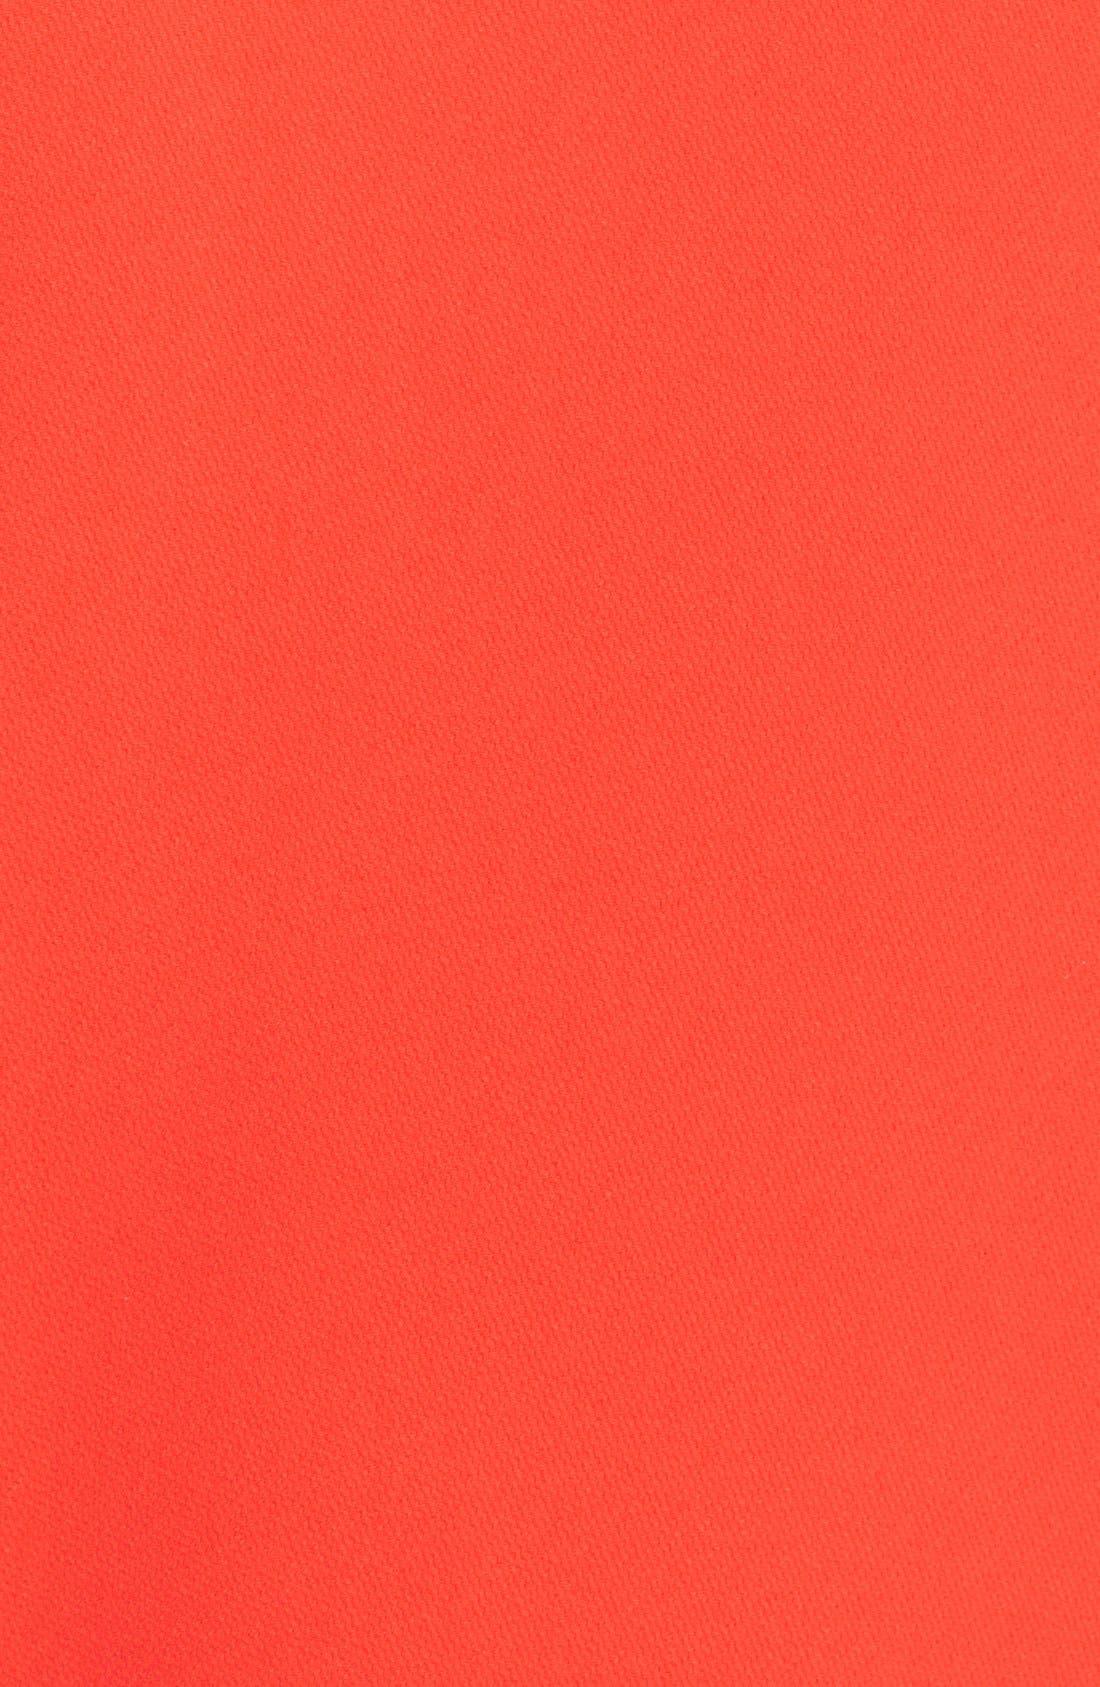 Drop Waist Knit Dress,                             Alternate thumbnail 15, color,